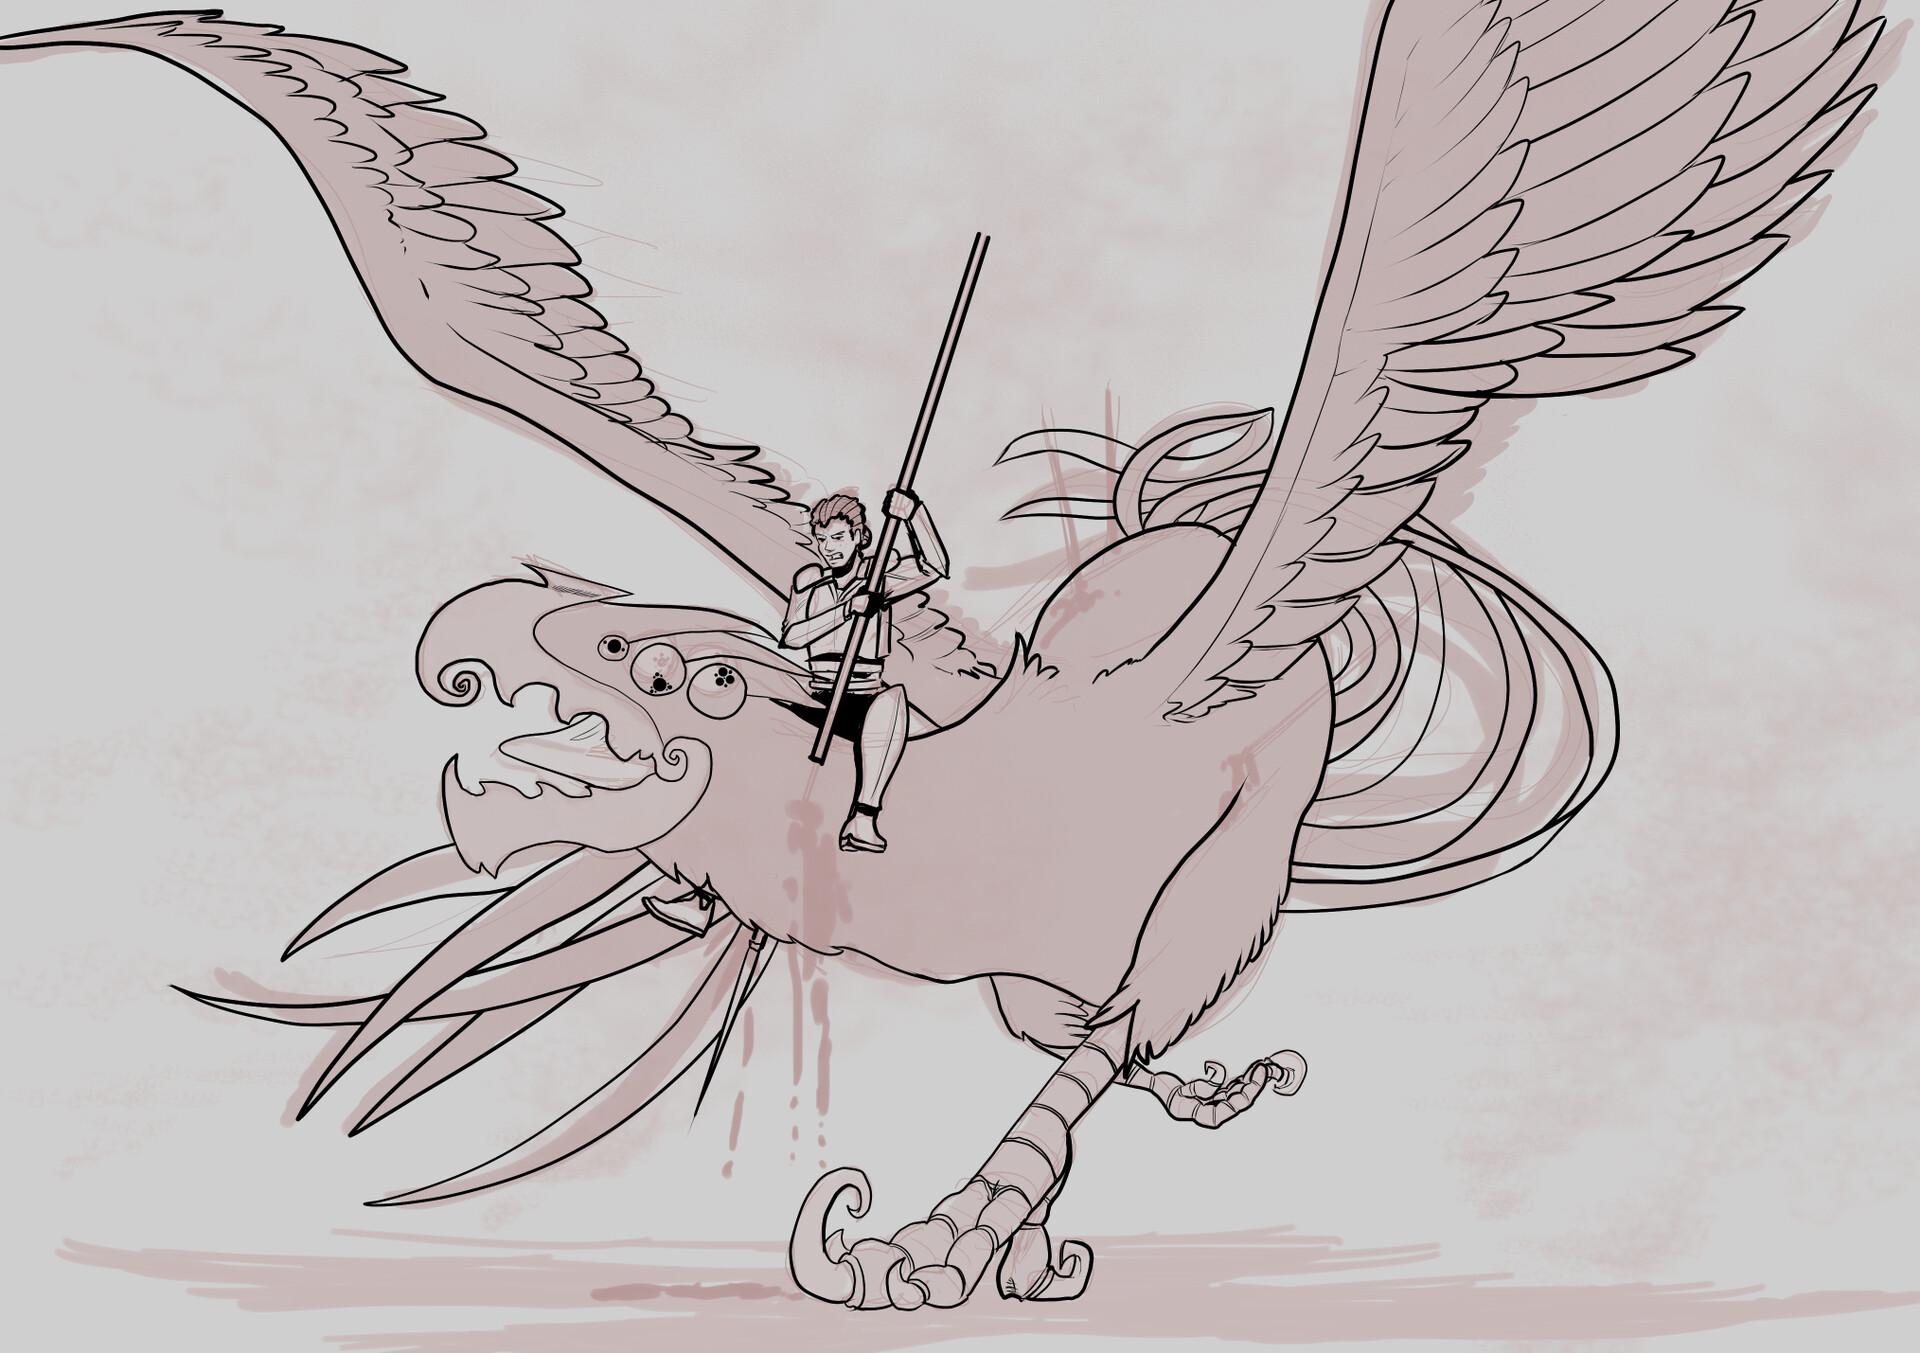 Michael davis slaying the umbrahawk